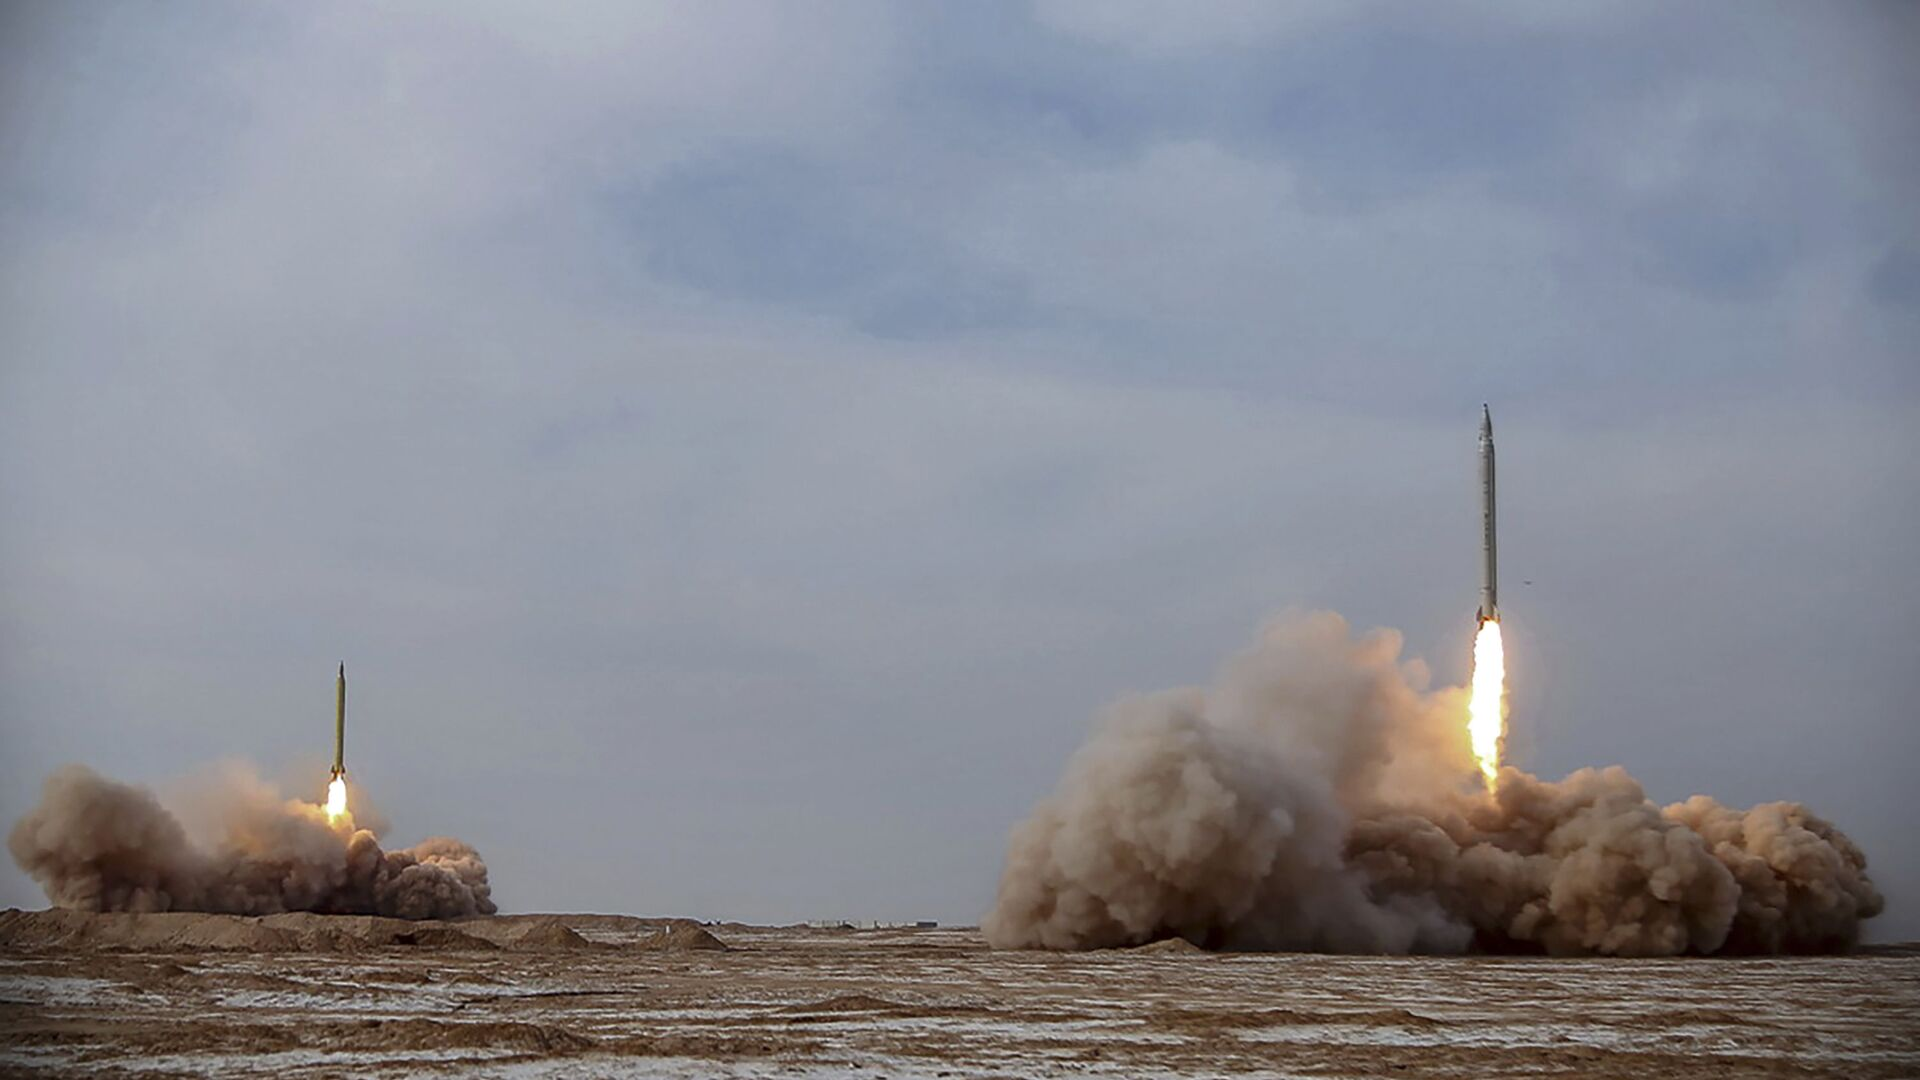 Lanzamiento de misiles balísticos por Irán - Sputnik Mundo, 1920, 15.03.2021